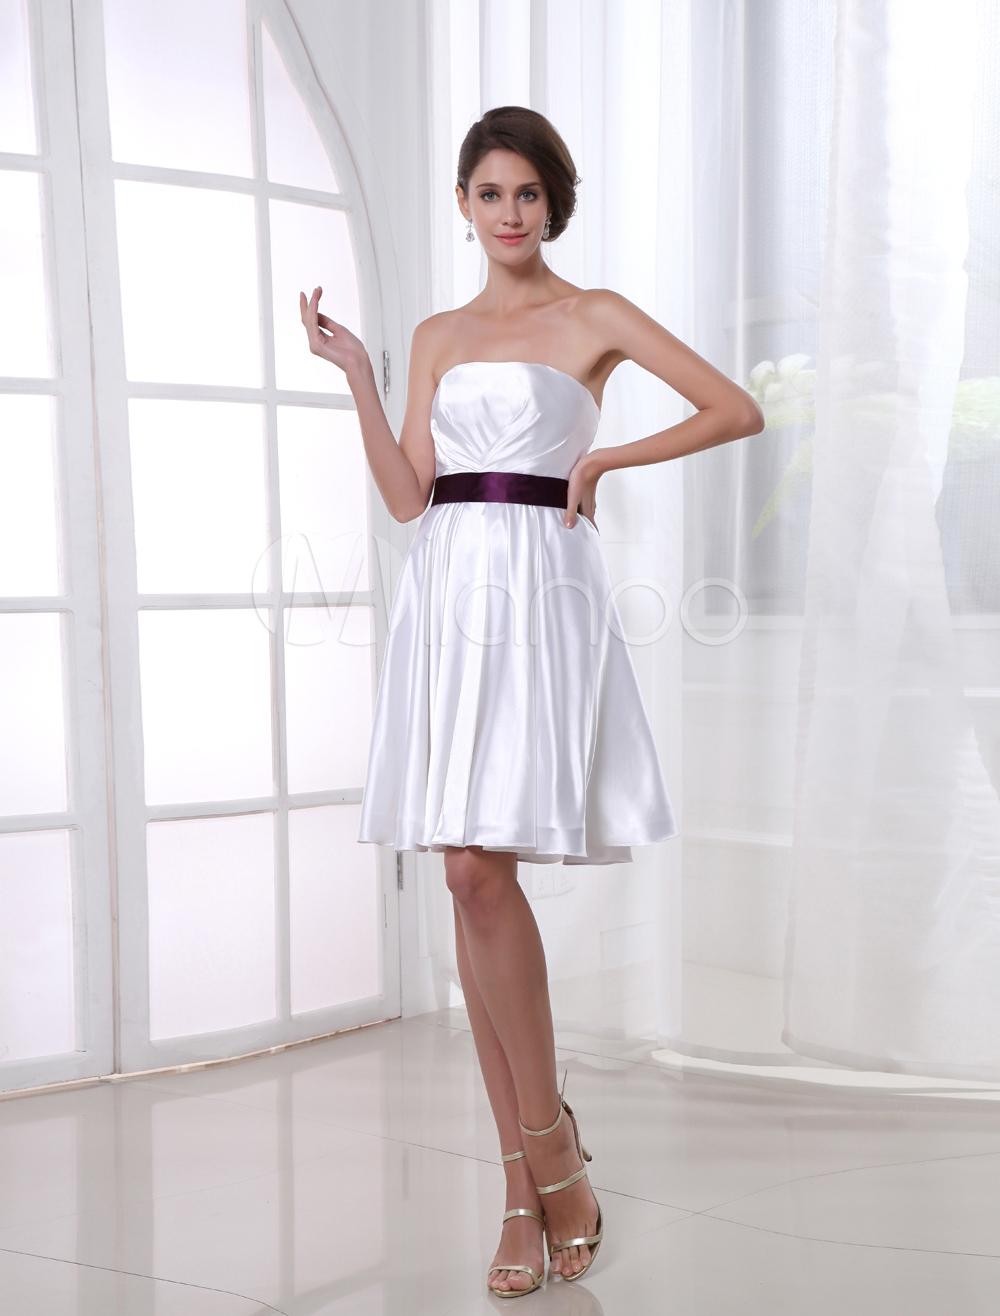 A-line White Strapless Knee-Length Fashion Cocktail Dress